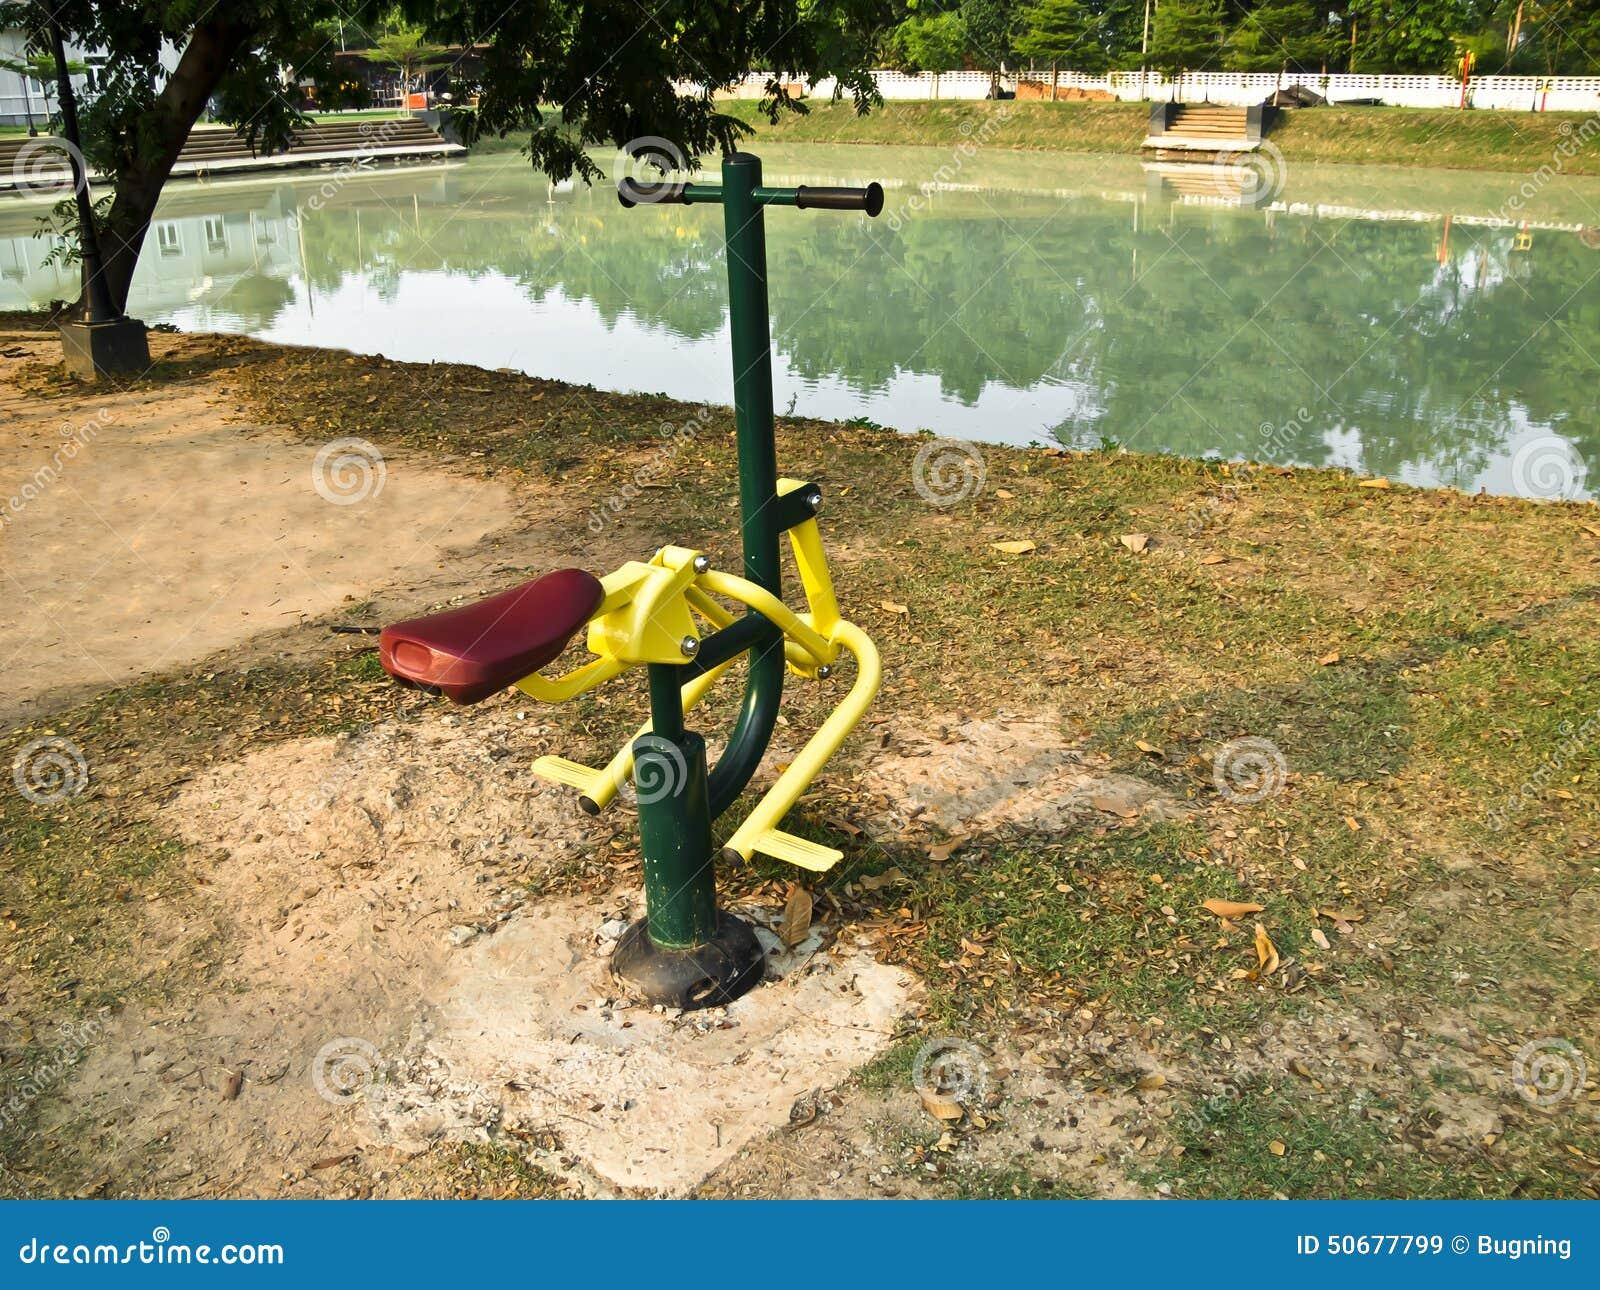 Download 操场 库存图片. 图片 包括有 公园, 橙色, 孩子, 外面, 设计, 腐土, 重新创建, 现代, 女演员 - 50677799